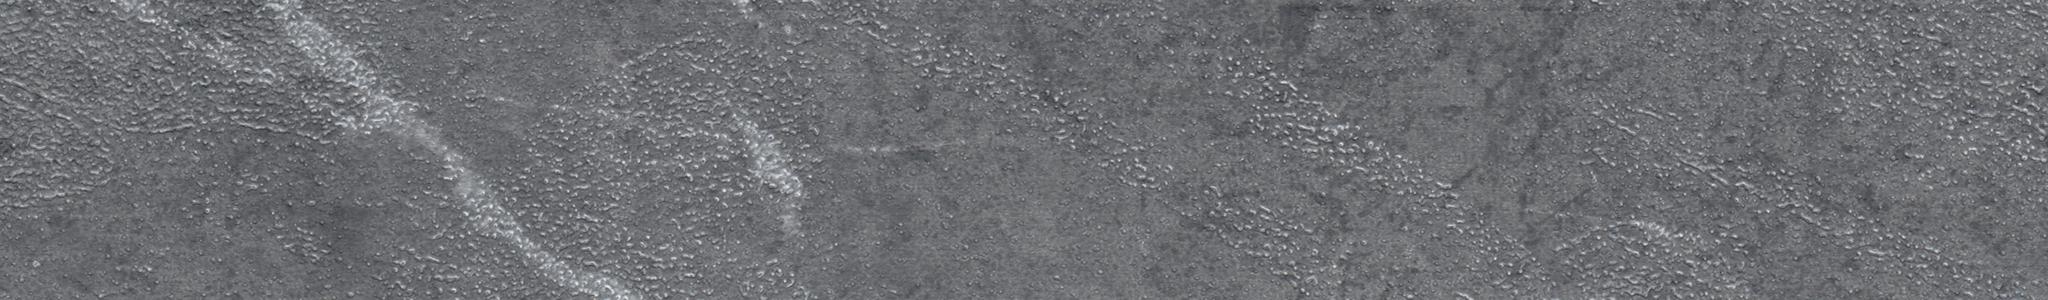 HD 292272 ABS hrana mramor